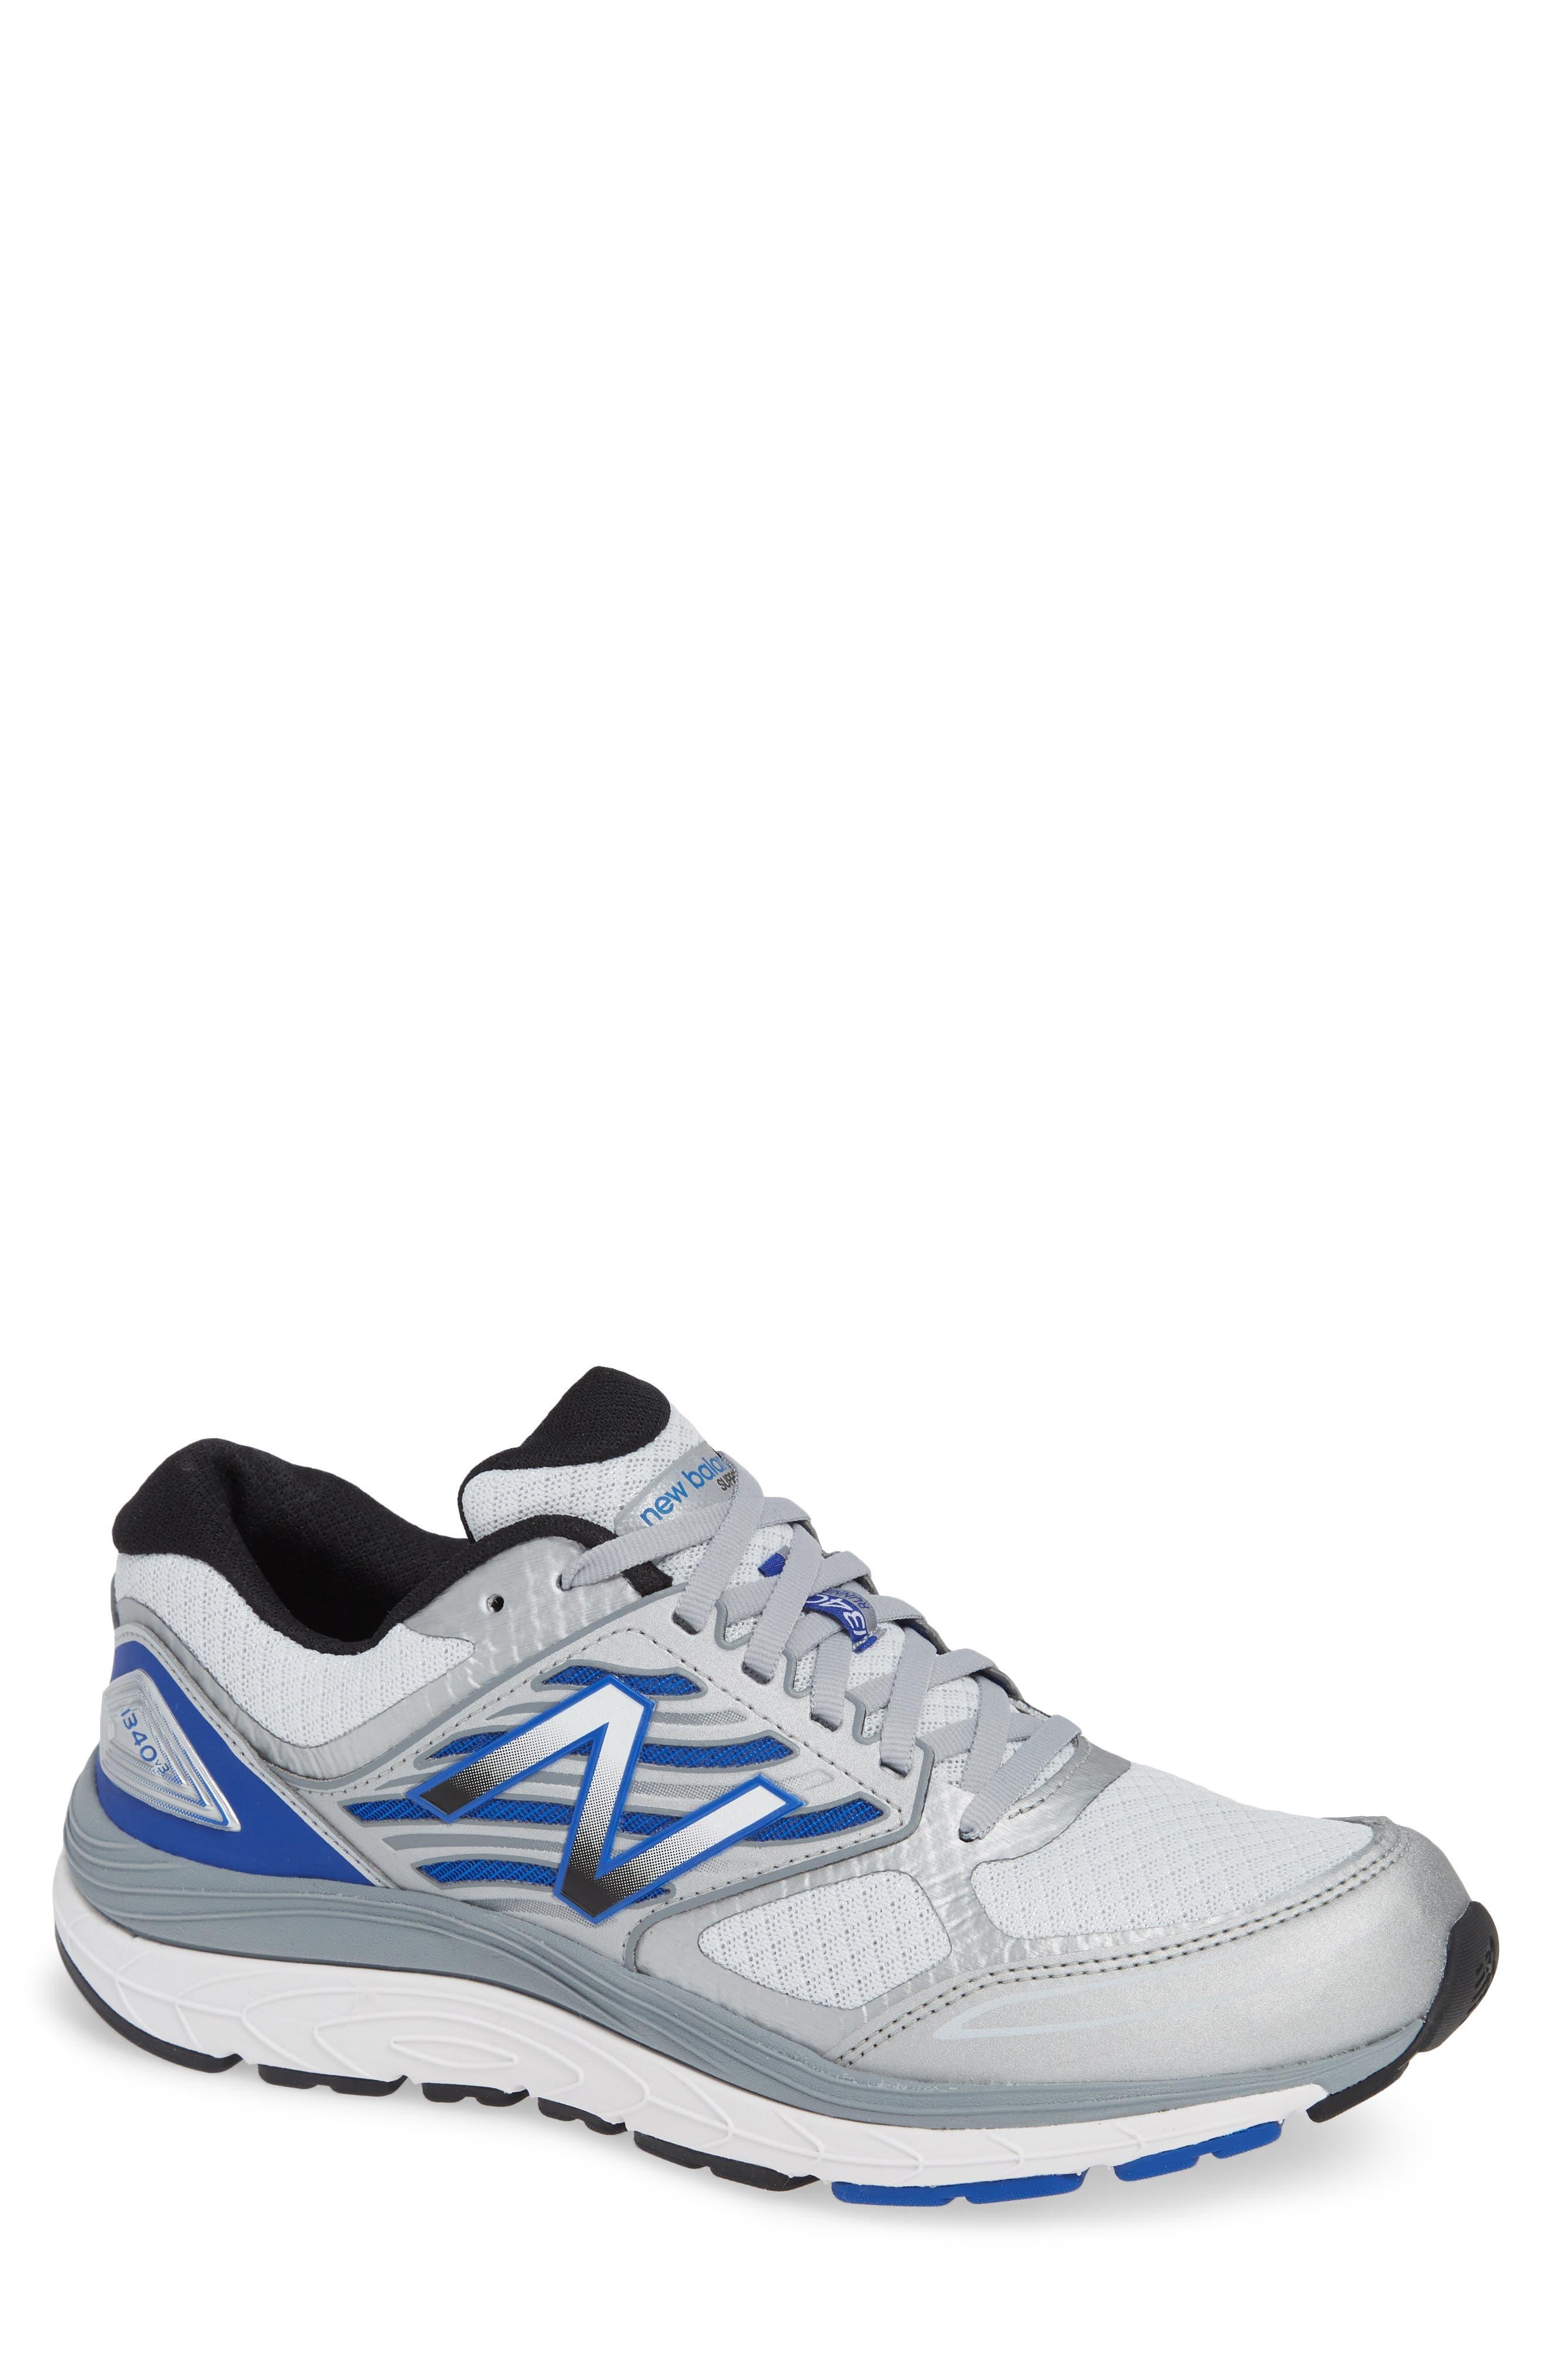 1340v3 Running Shoe,                             Main thumbnail 1, color,                             WHITE